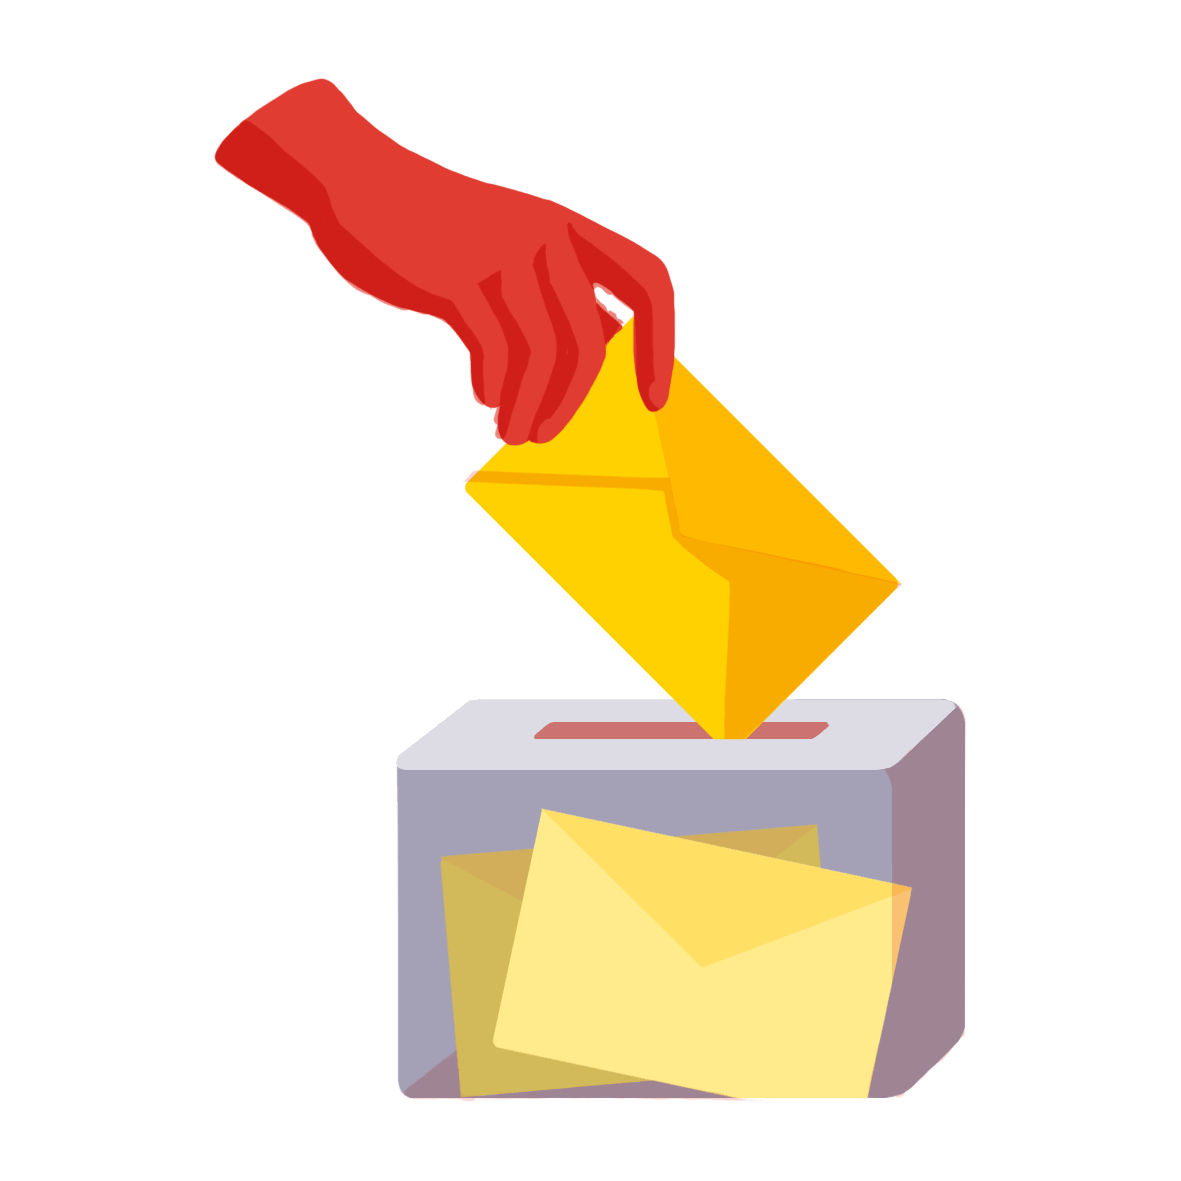 democratie-boma-france.png